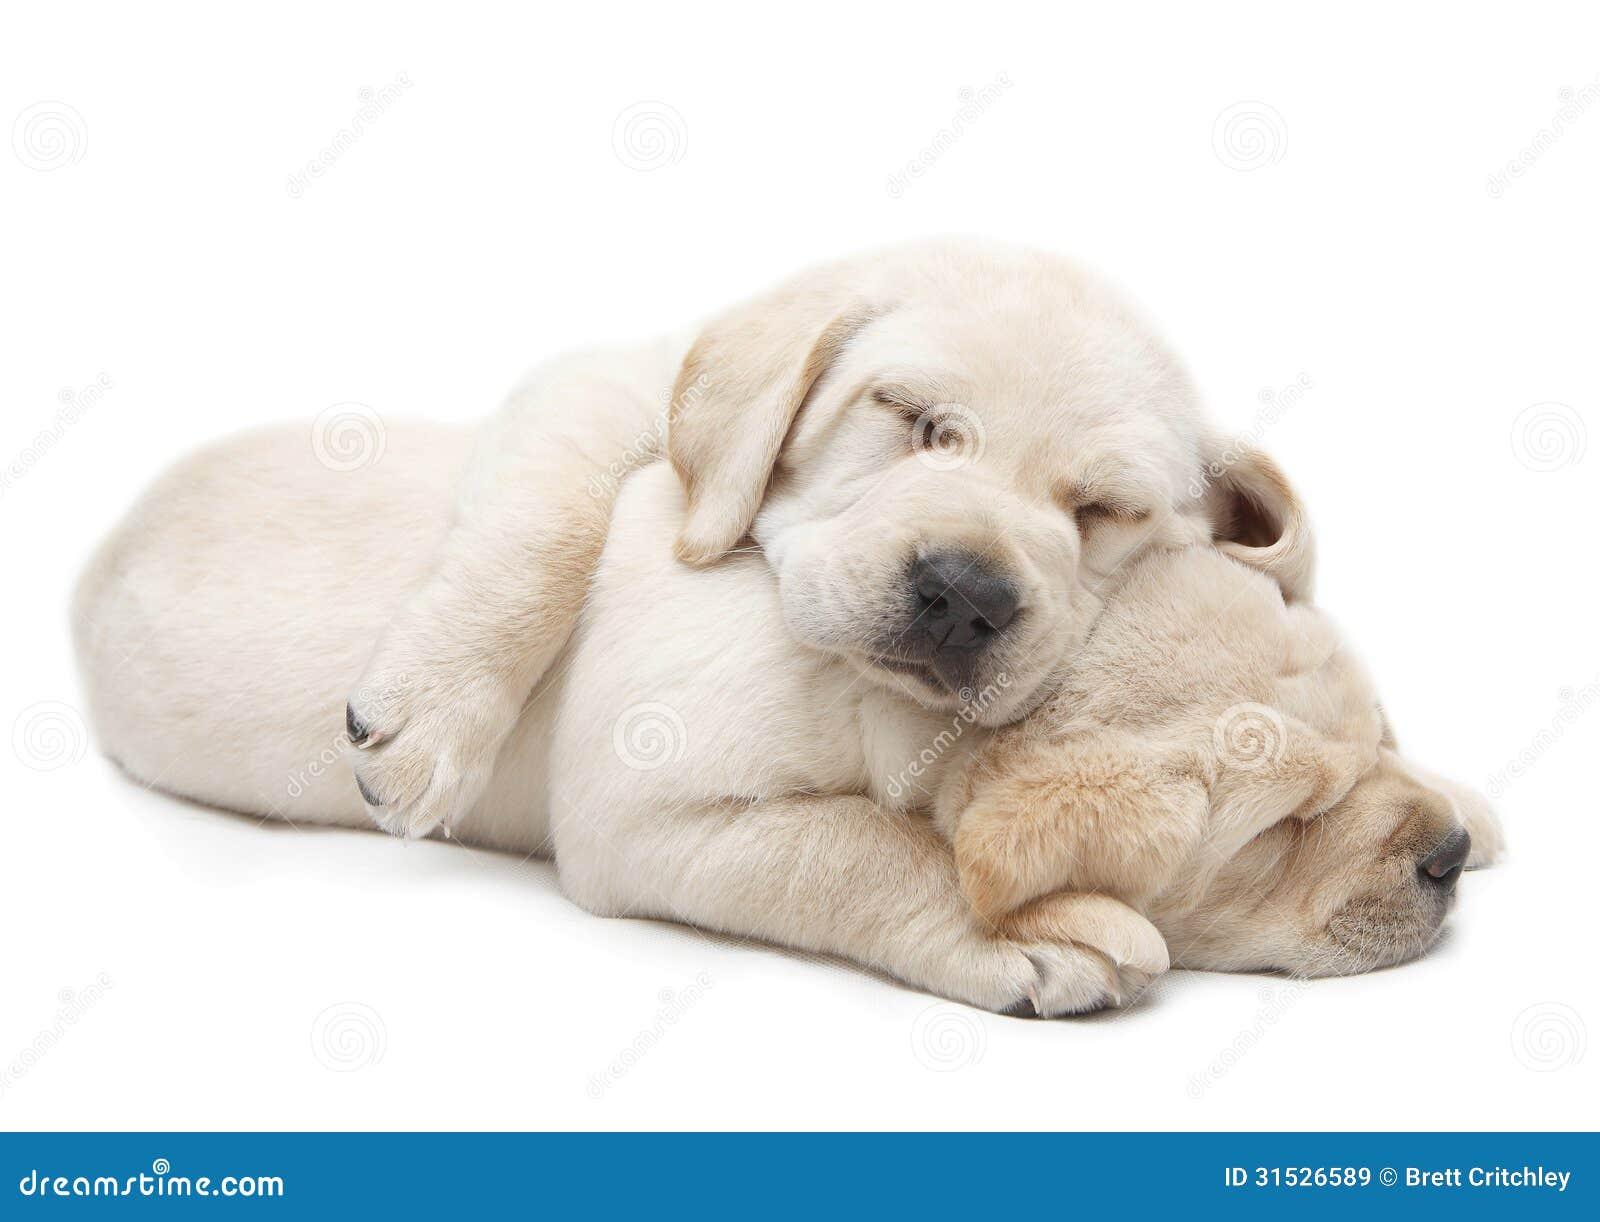 Sleeping Labrador puppies